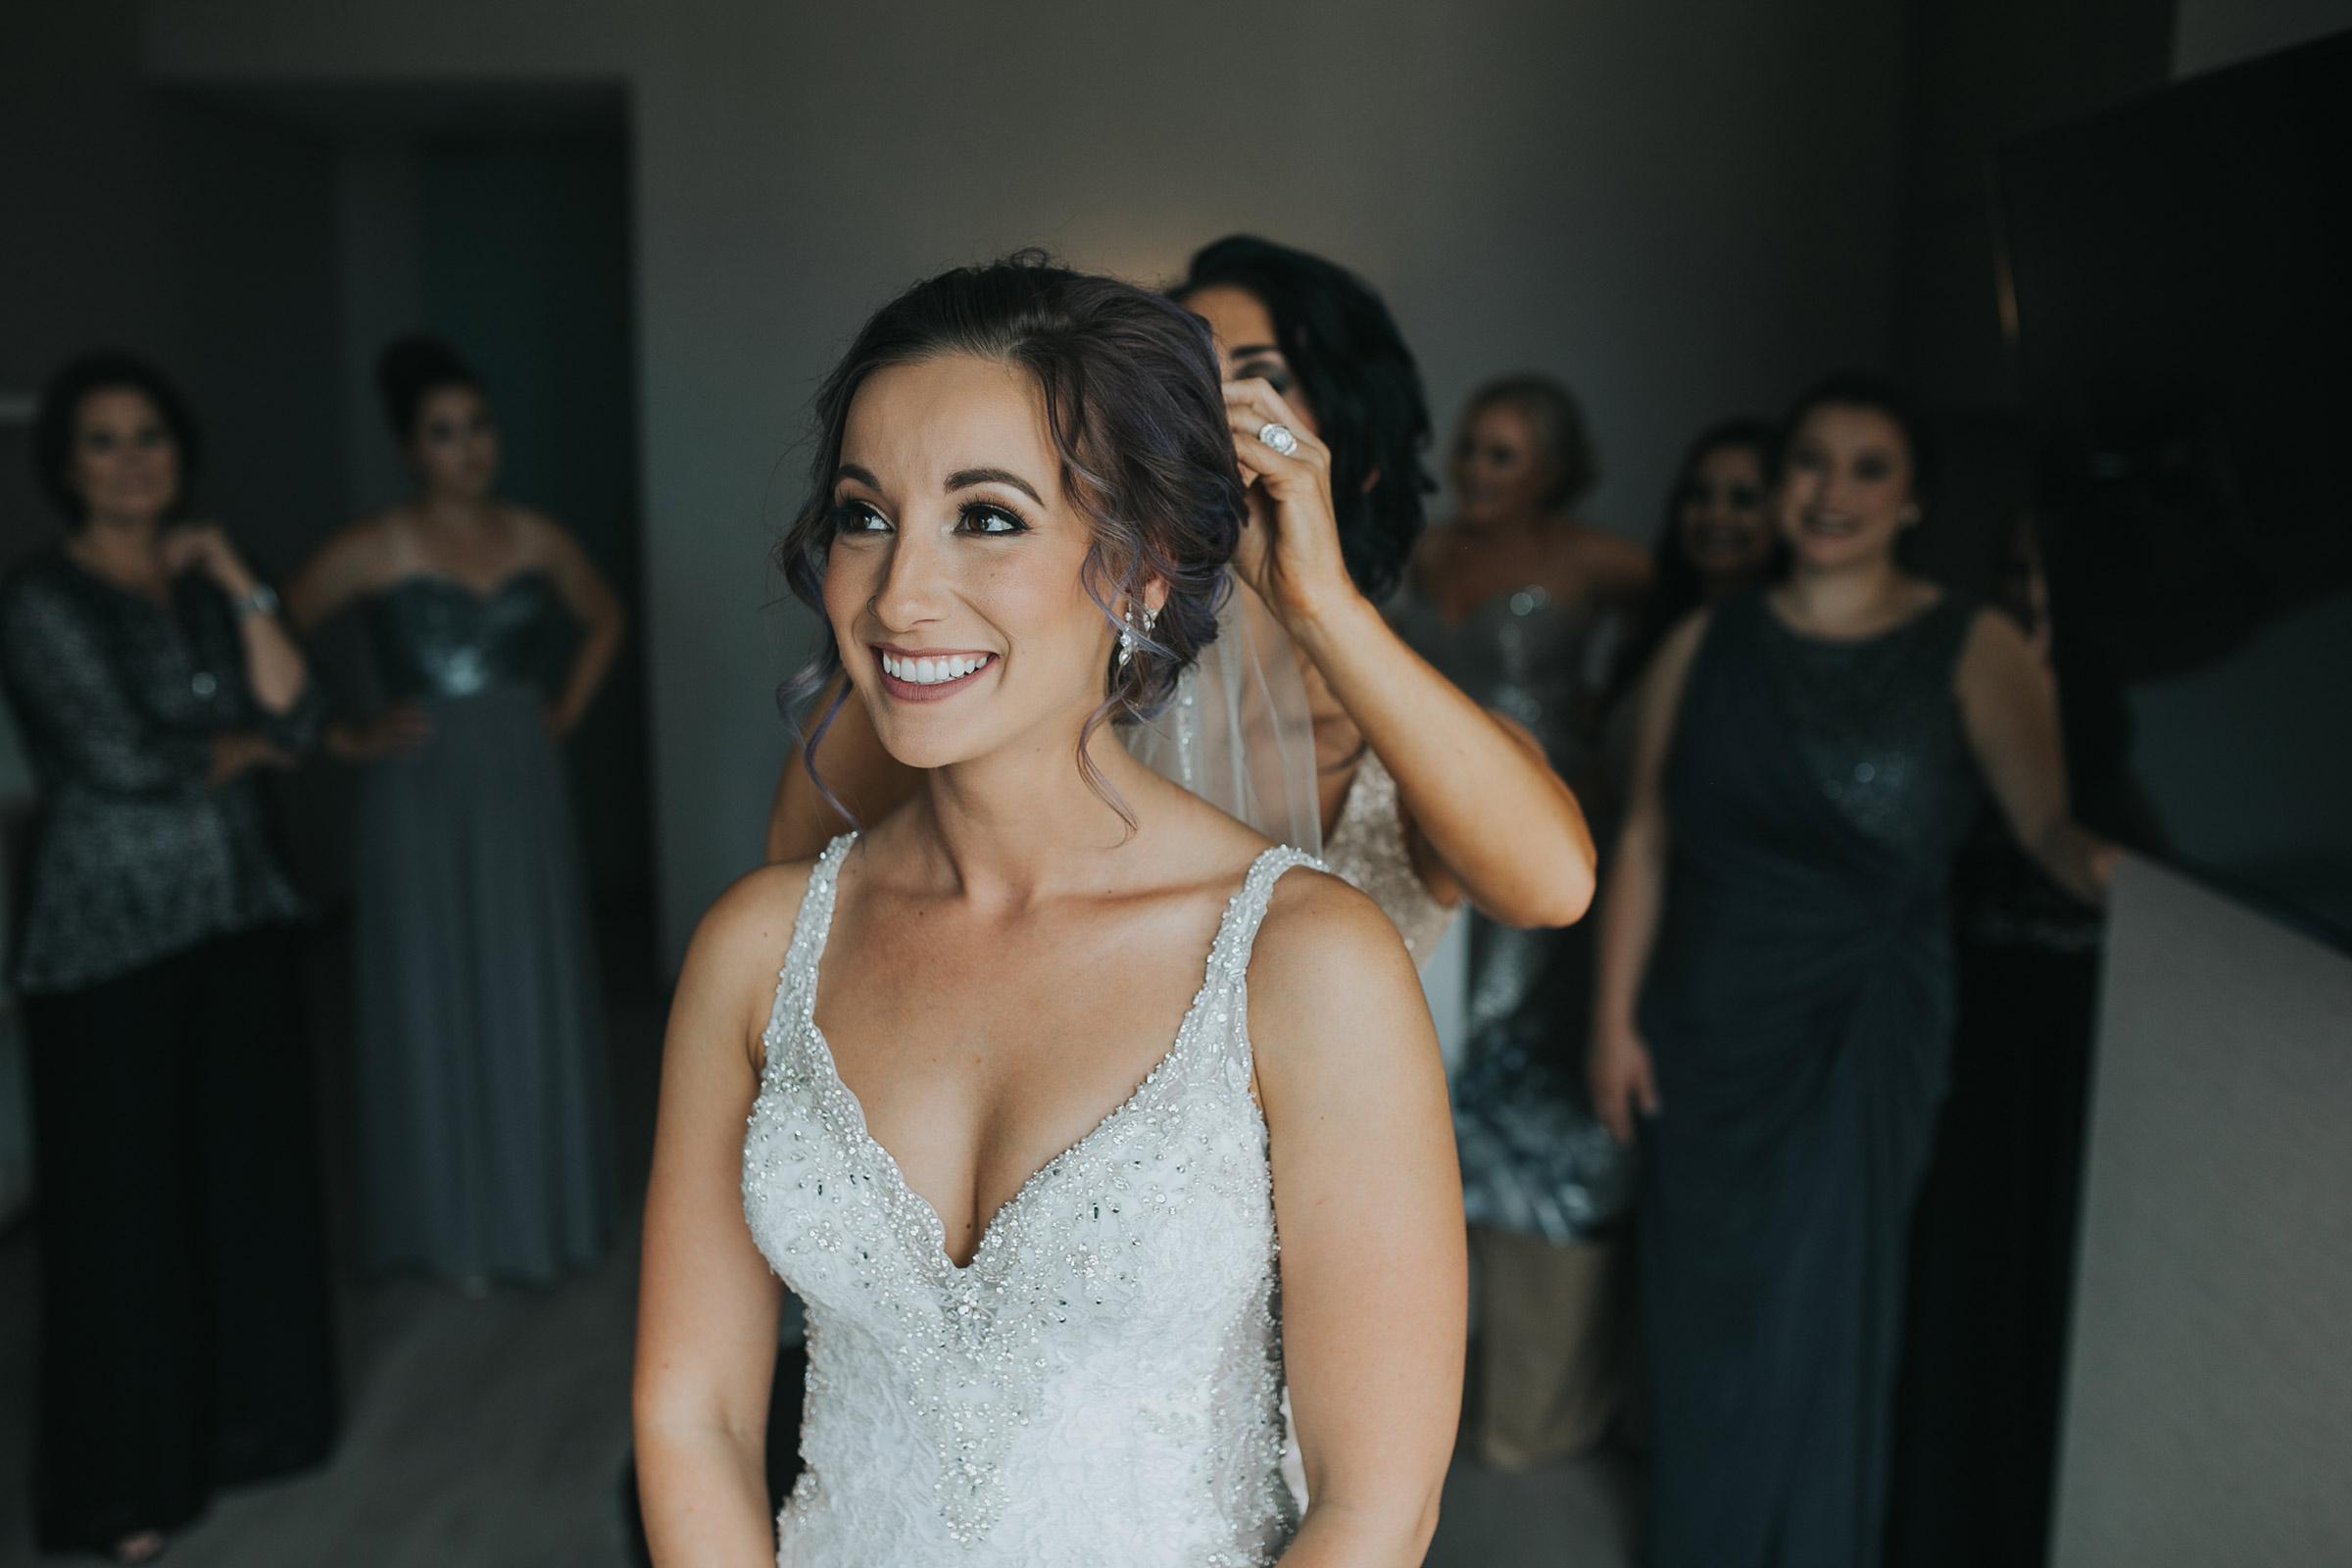 bride-putting-veil-on-with-bridesmaid-desmoines-iowa-ac-hotel-raelyn-ramey-photography.jpg